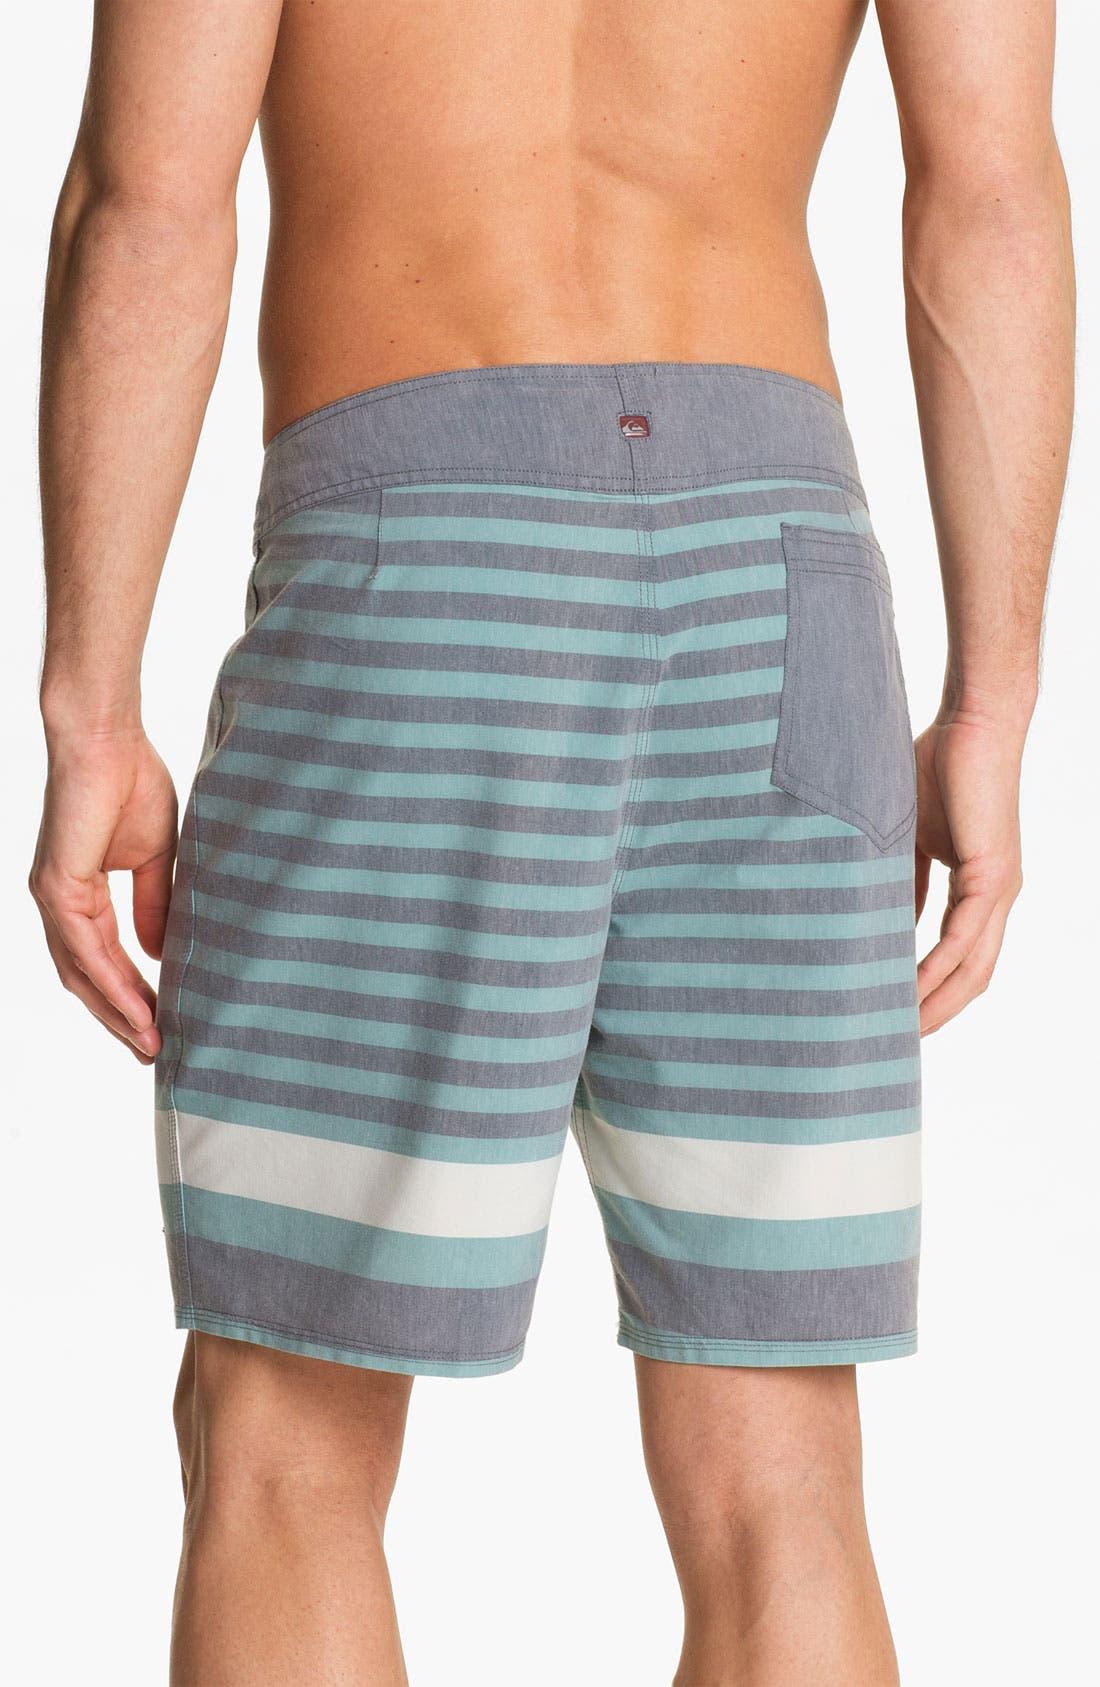 Alternate Image 2  - Quiksilver 'Biarritz' Stripe Board Shorts